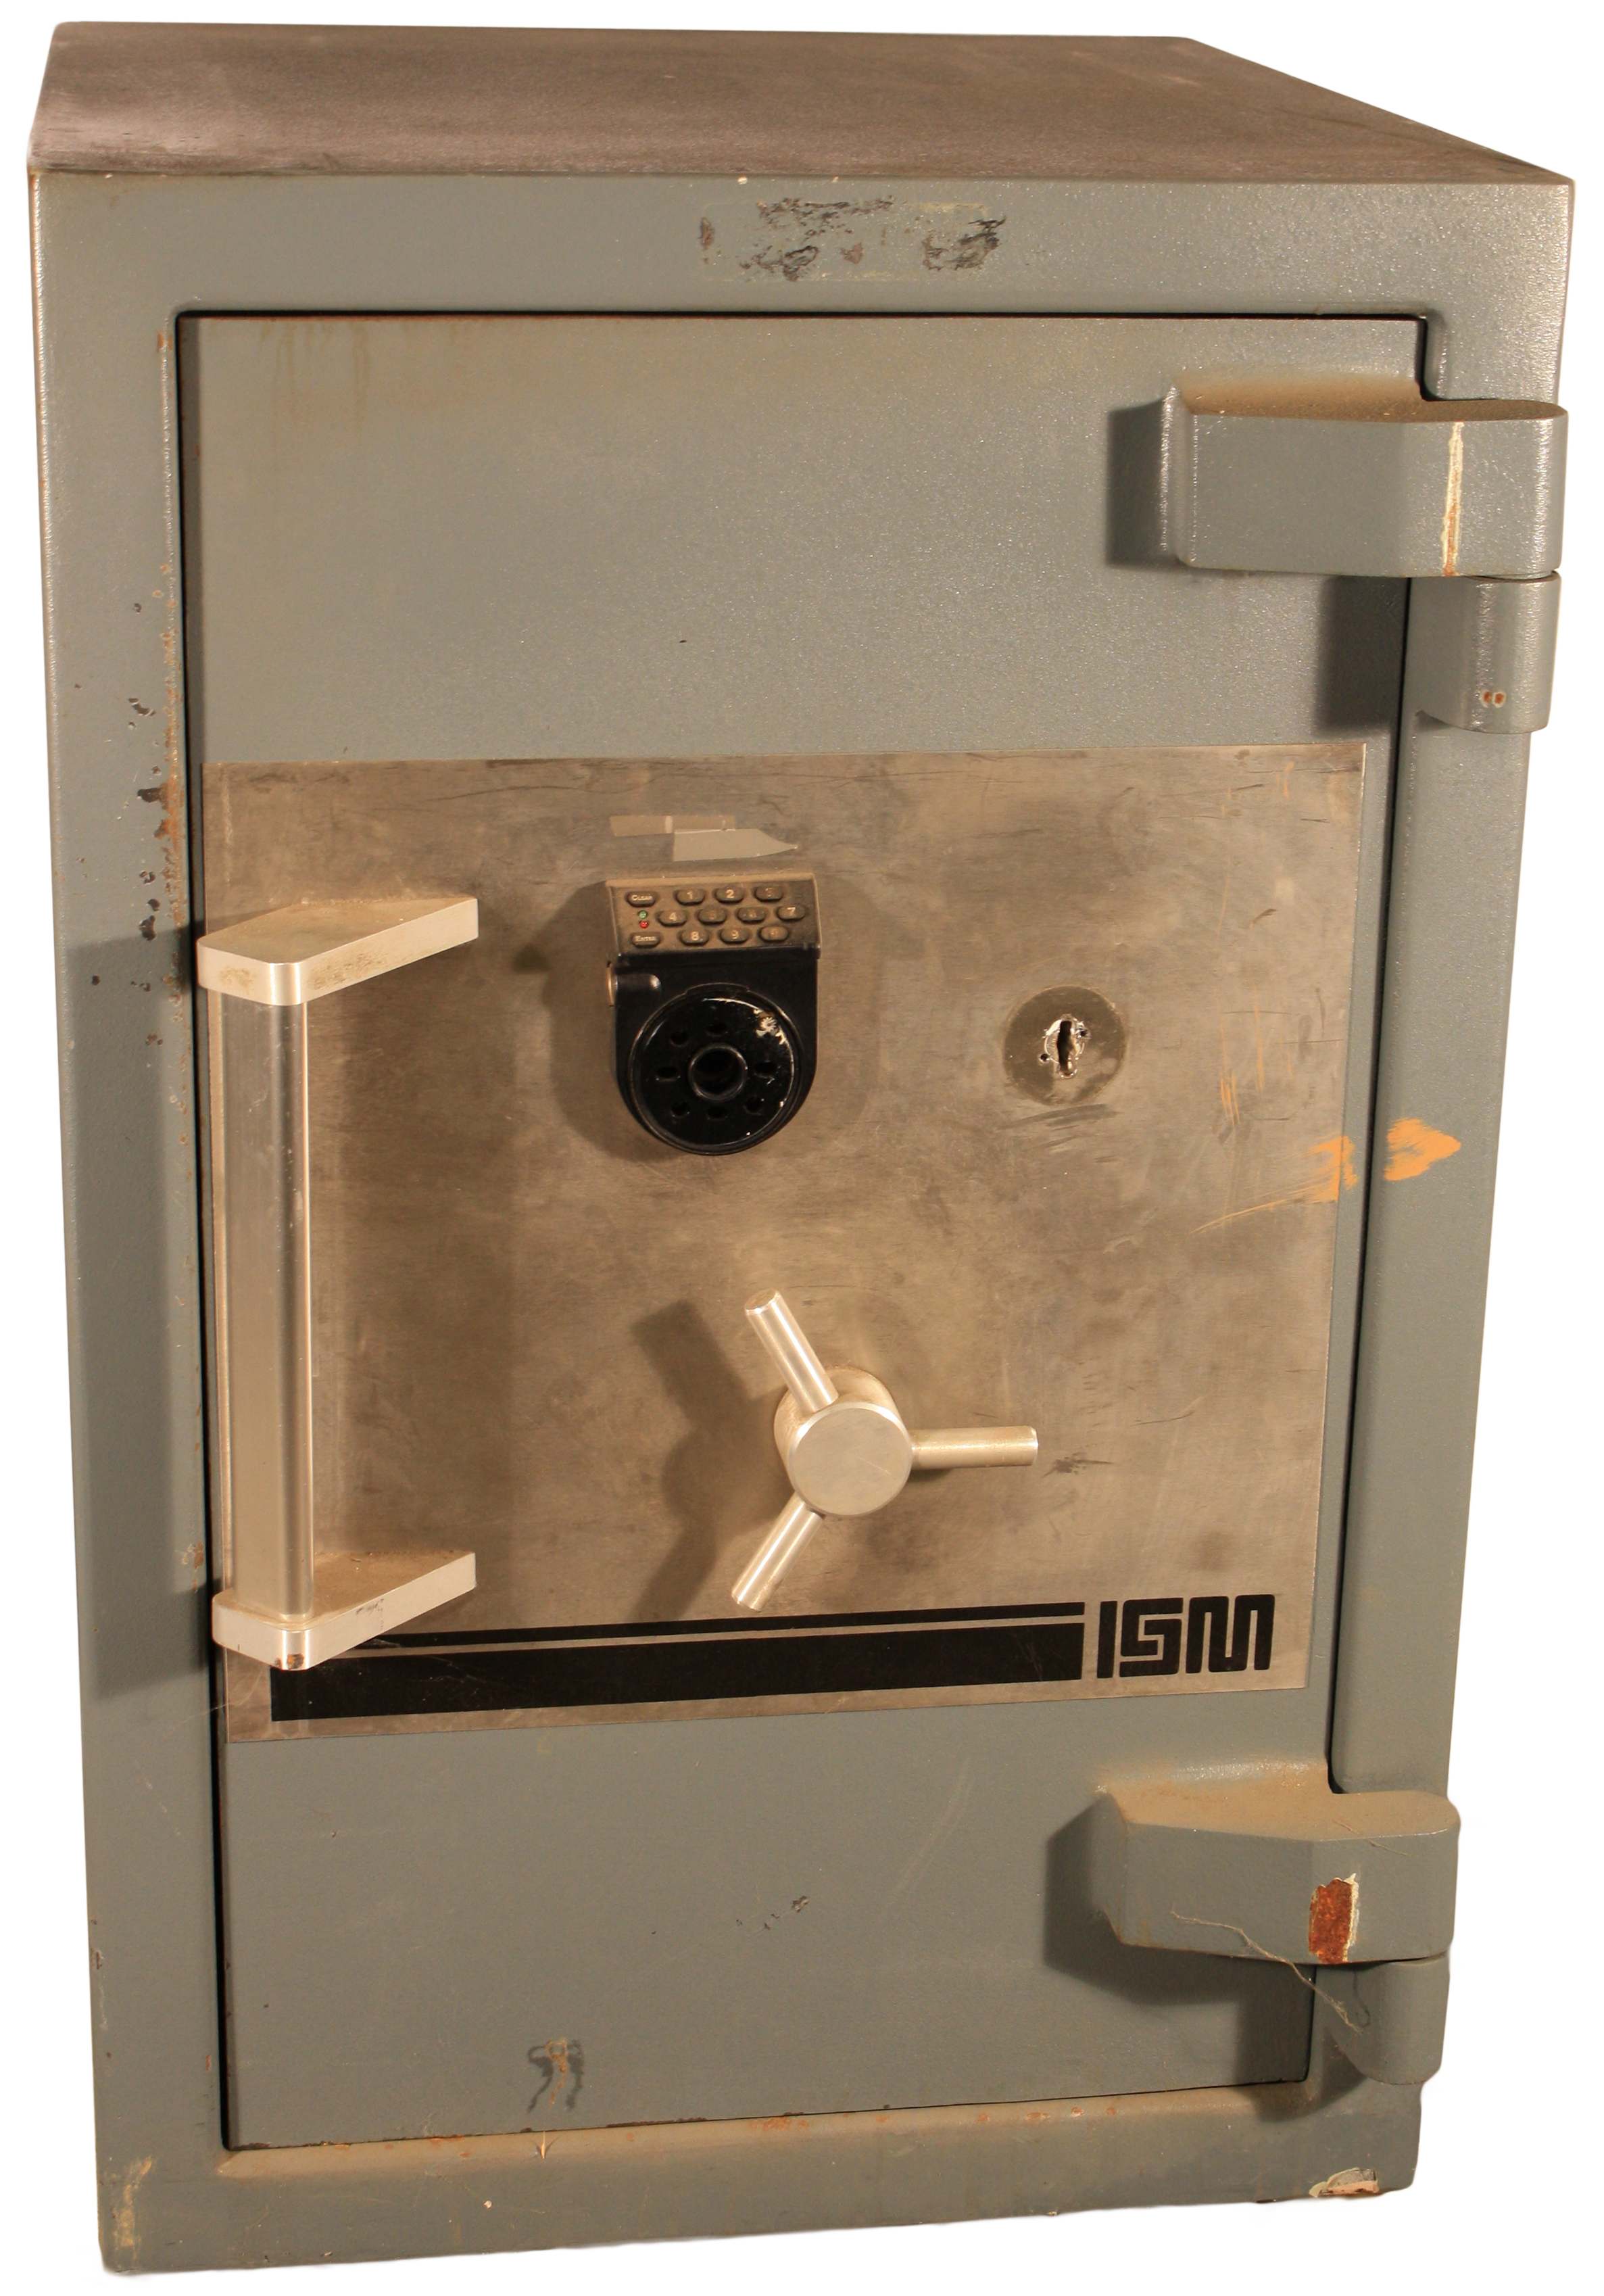 TL-30 ISM Bullion model BU-3521 used safe